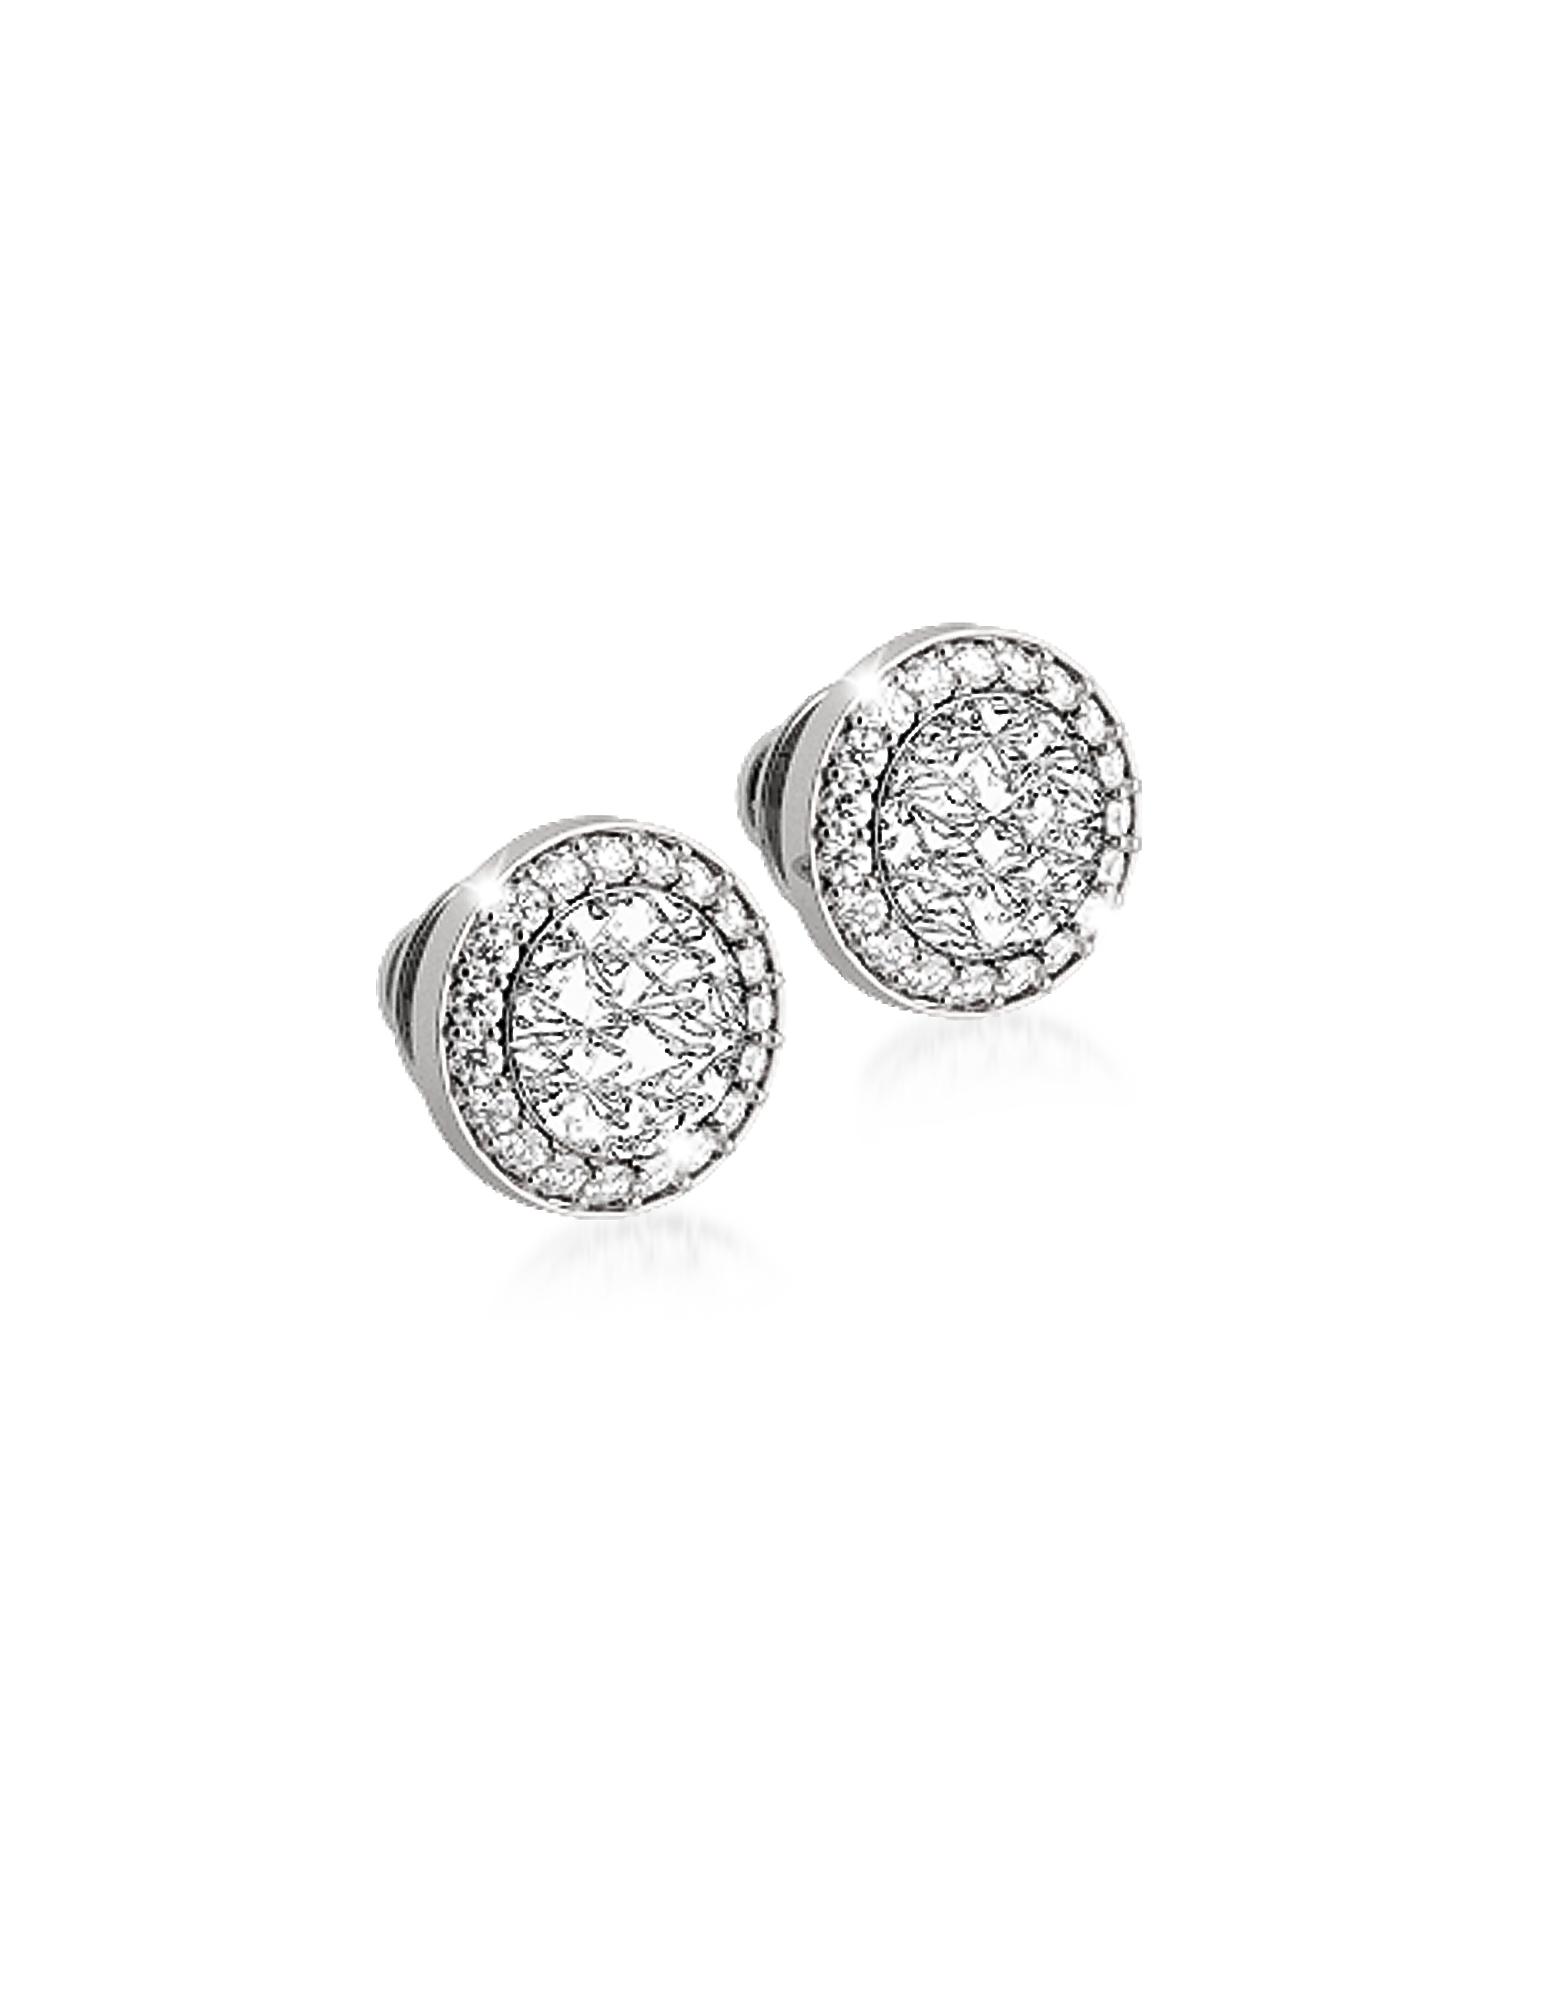 R-ZERO Rhodium Over Bronze Stud Earrings